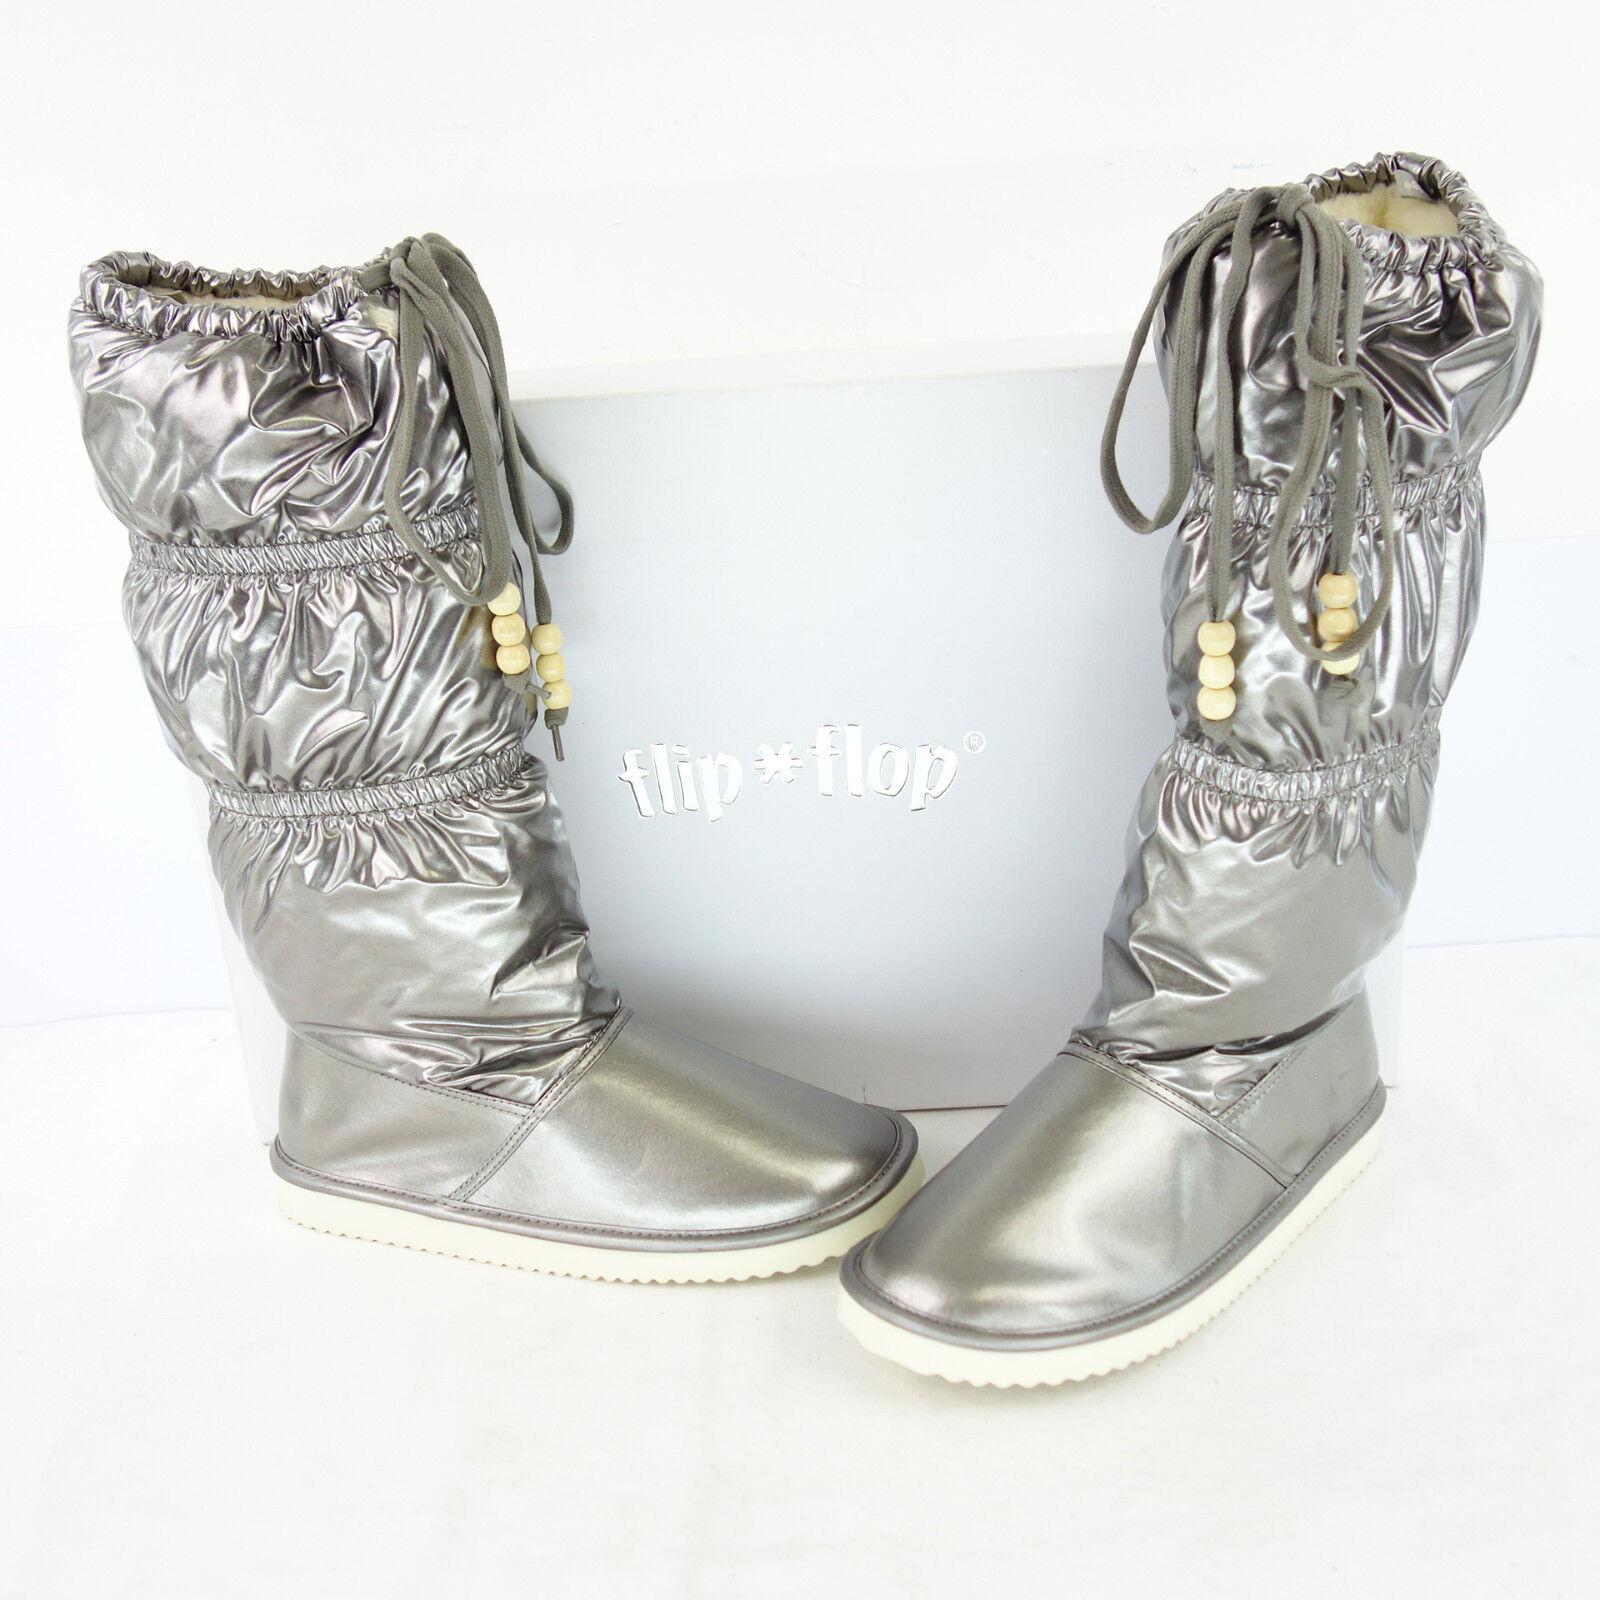 FLIP FLOP Damen Stiefel Stiefel Schuhe Bronze Platin Metallic gefüttert NP 109 NEU